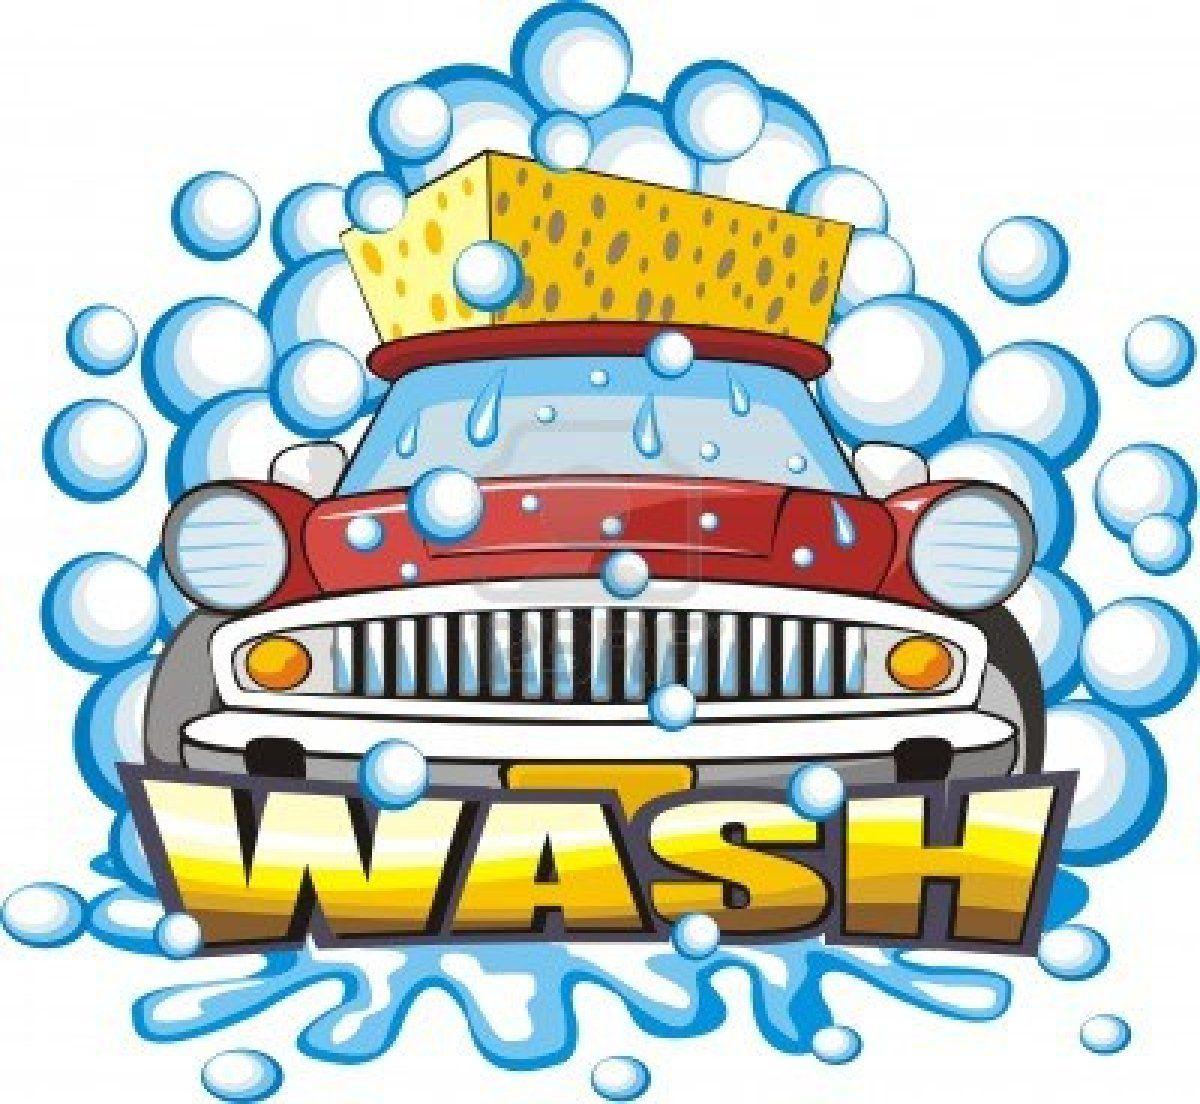 Pin de ford chao en Car Wash | Pinterest